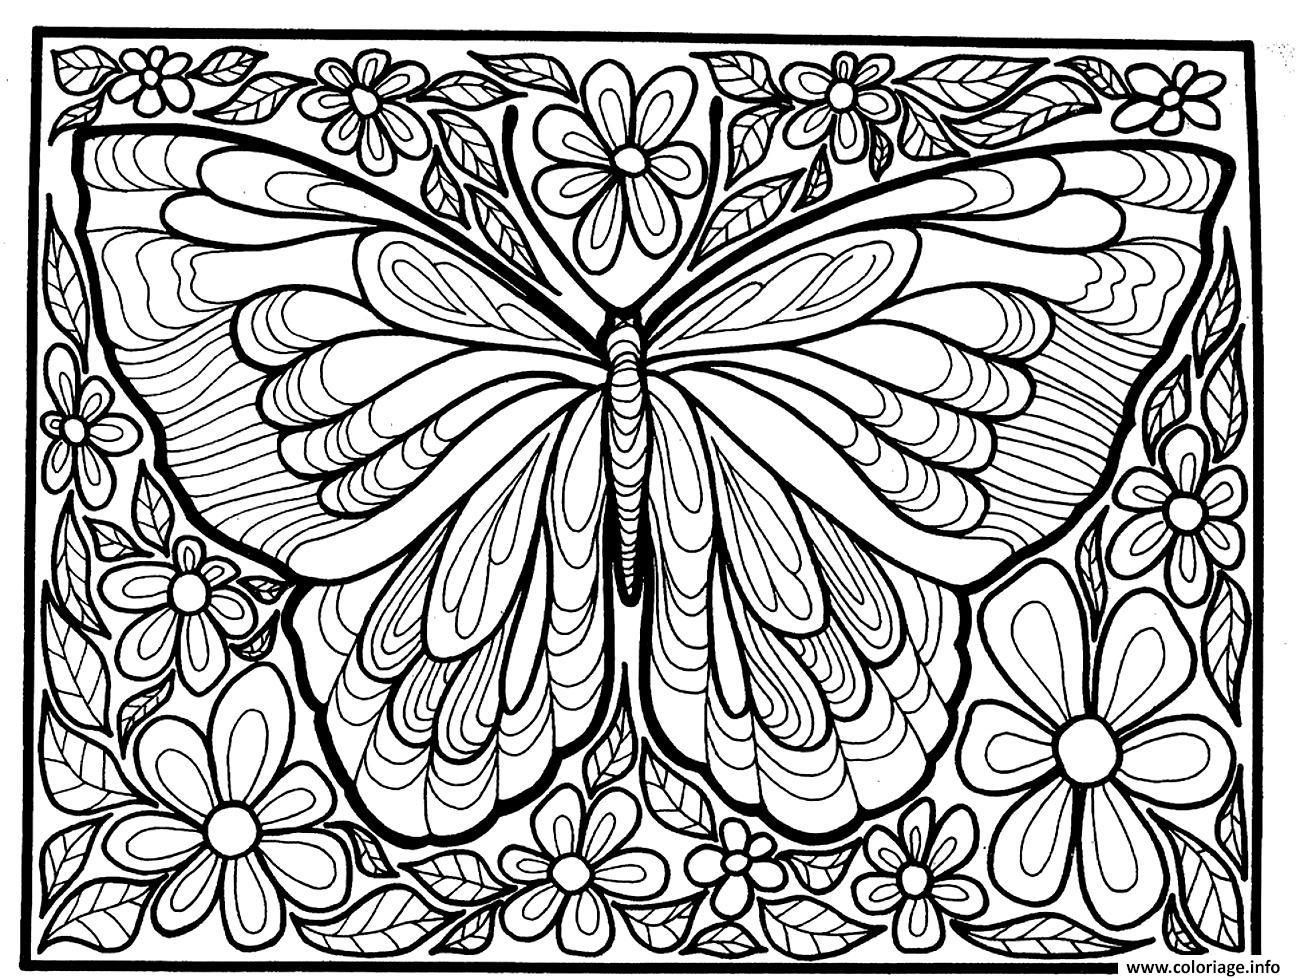 coloriage adulte difficile grand papillon dessin imprimer - Coloriage De Grand